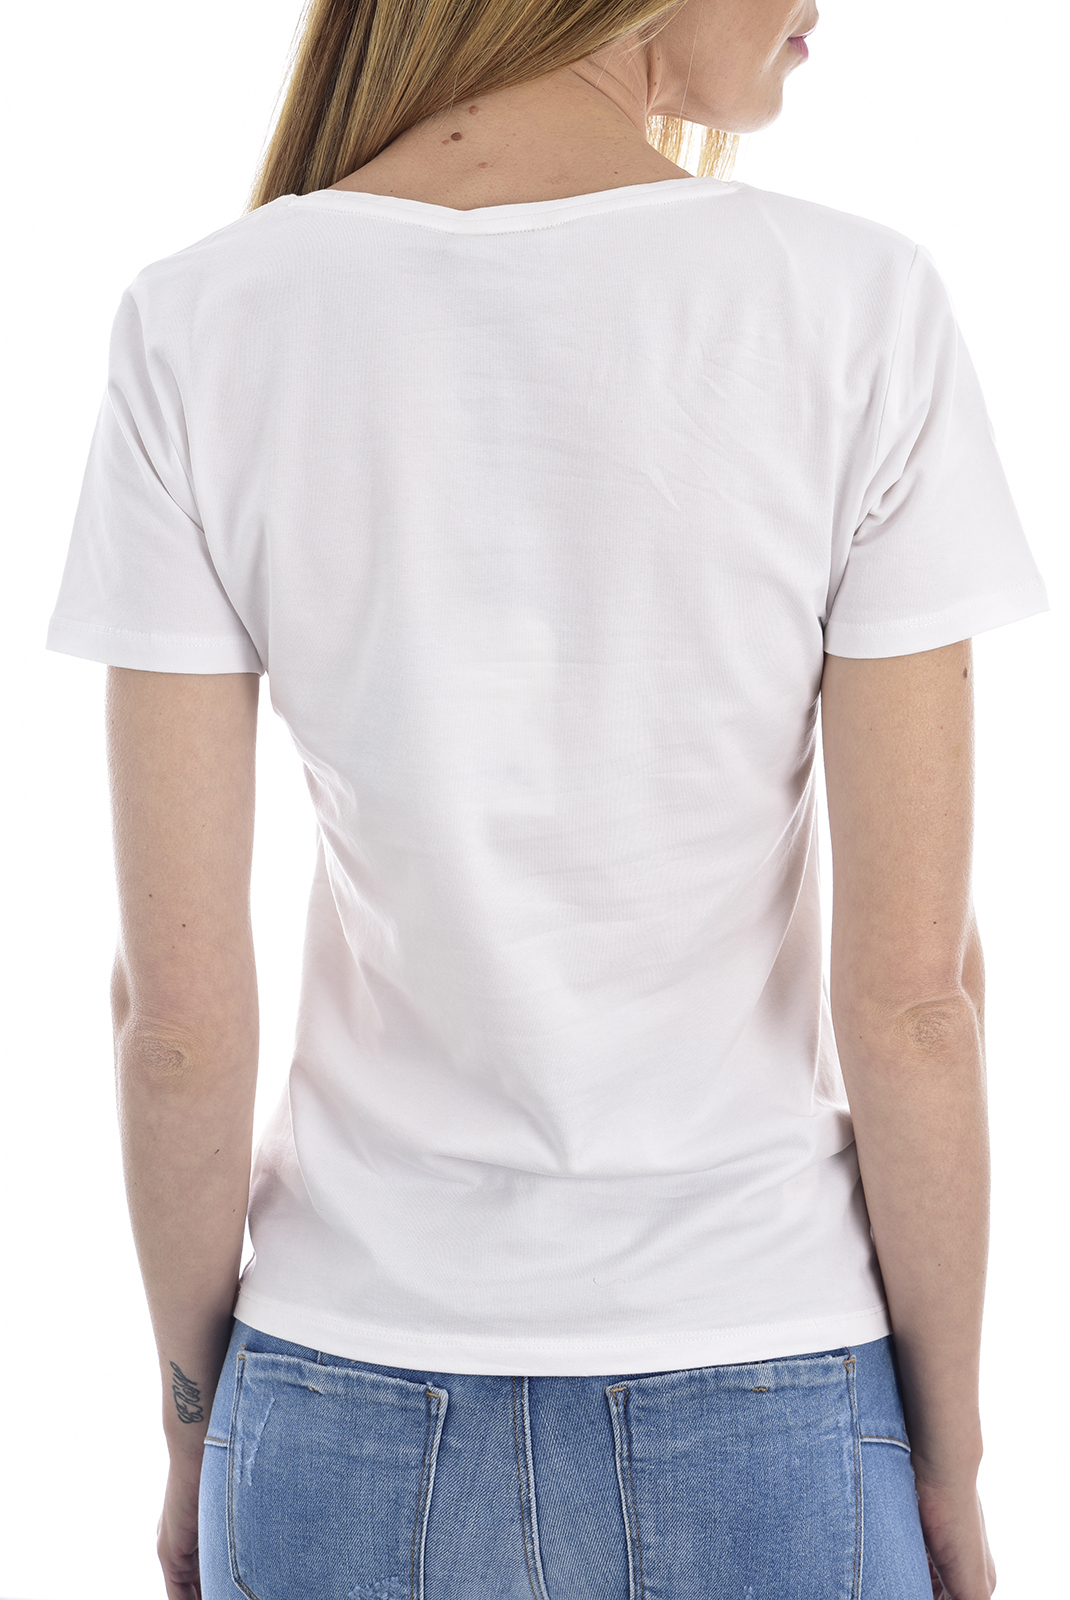 Tee shirt  Kaporal RAP WHITE